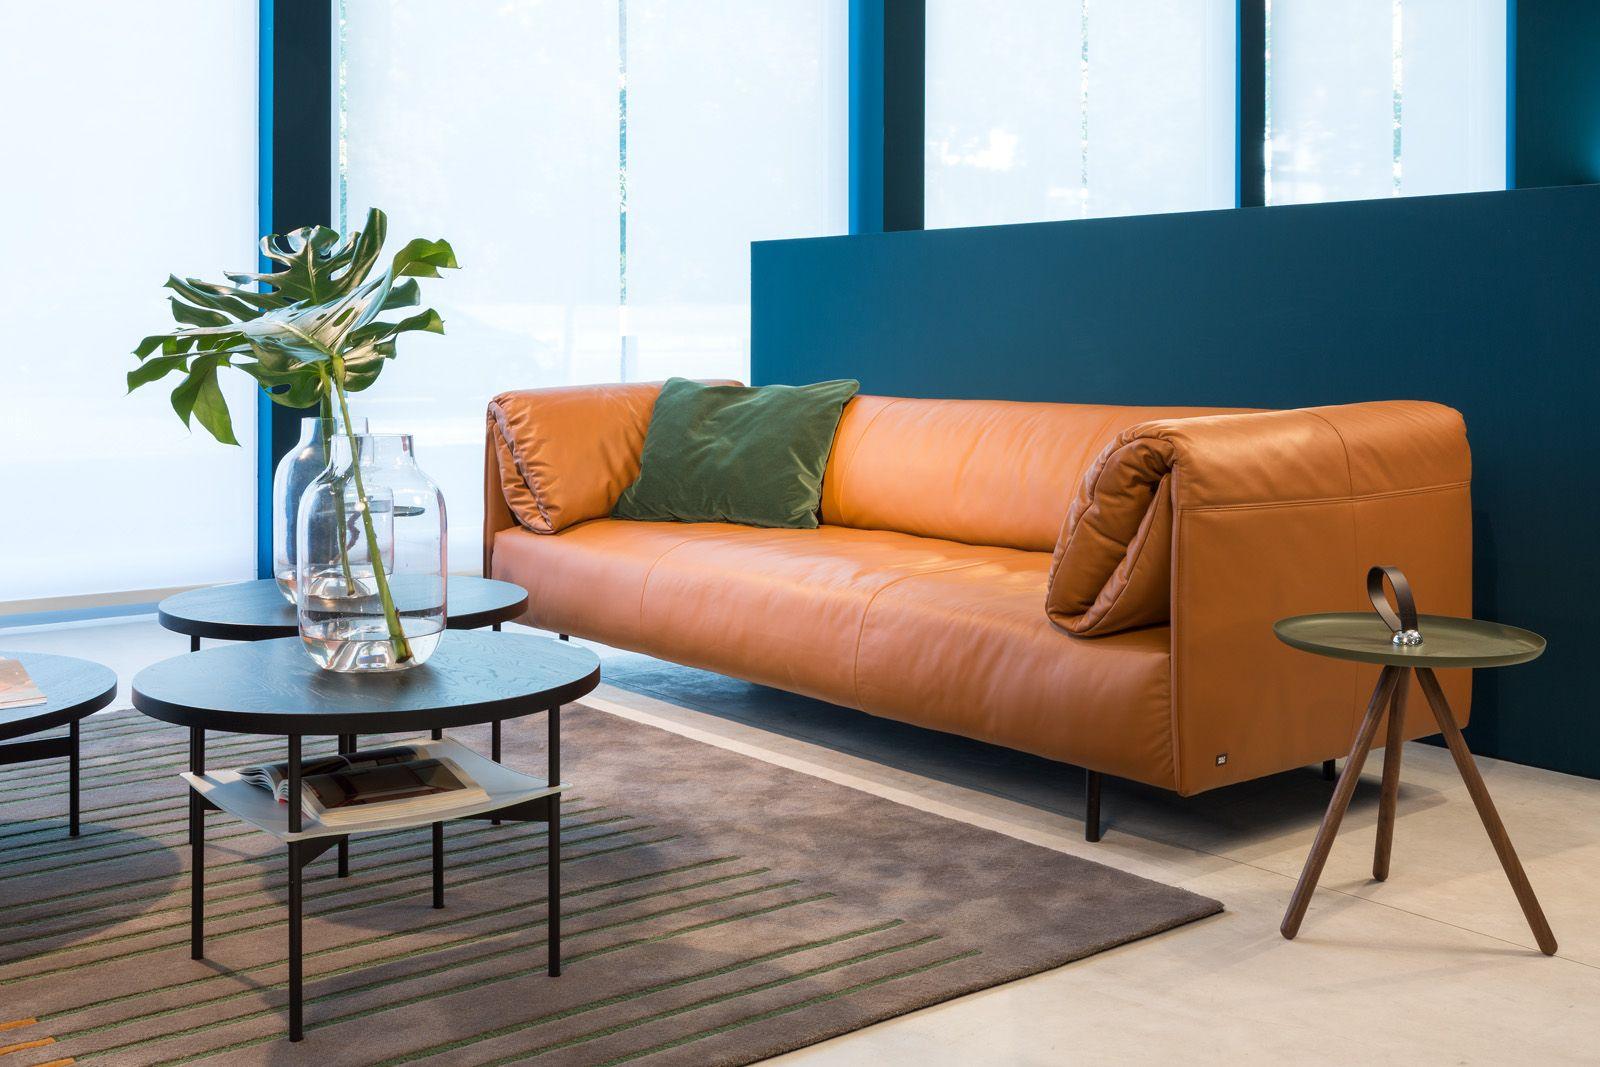 studio anise rolf benz 50 sofa. Brilliant Sofa Studio Anise Rolf Benz 50 Sofa Alma Available At  In Studio Anise Rolf Benz Sofa